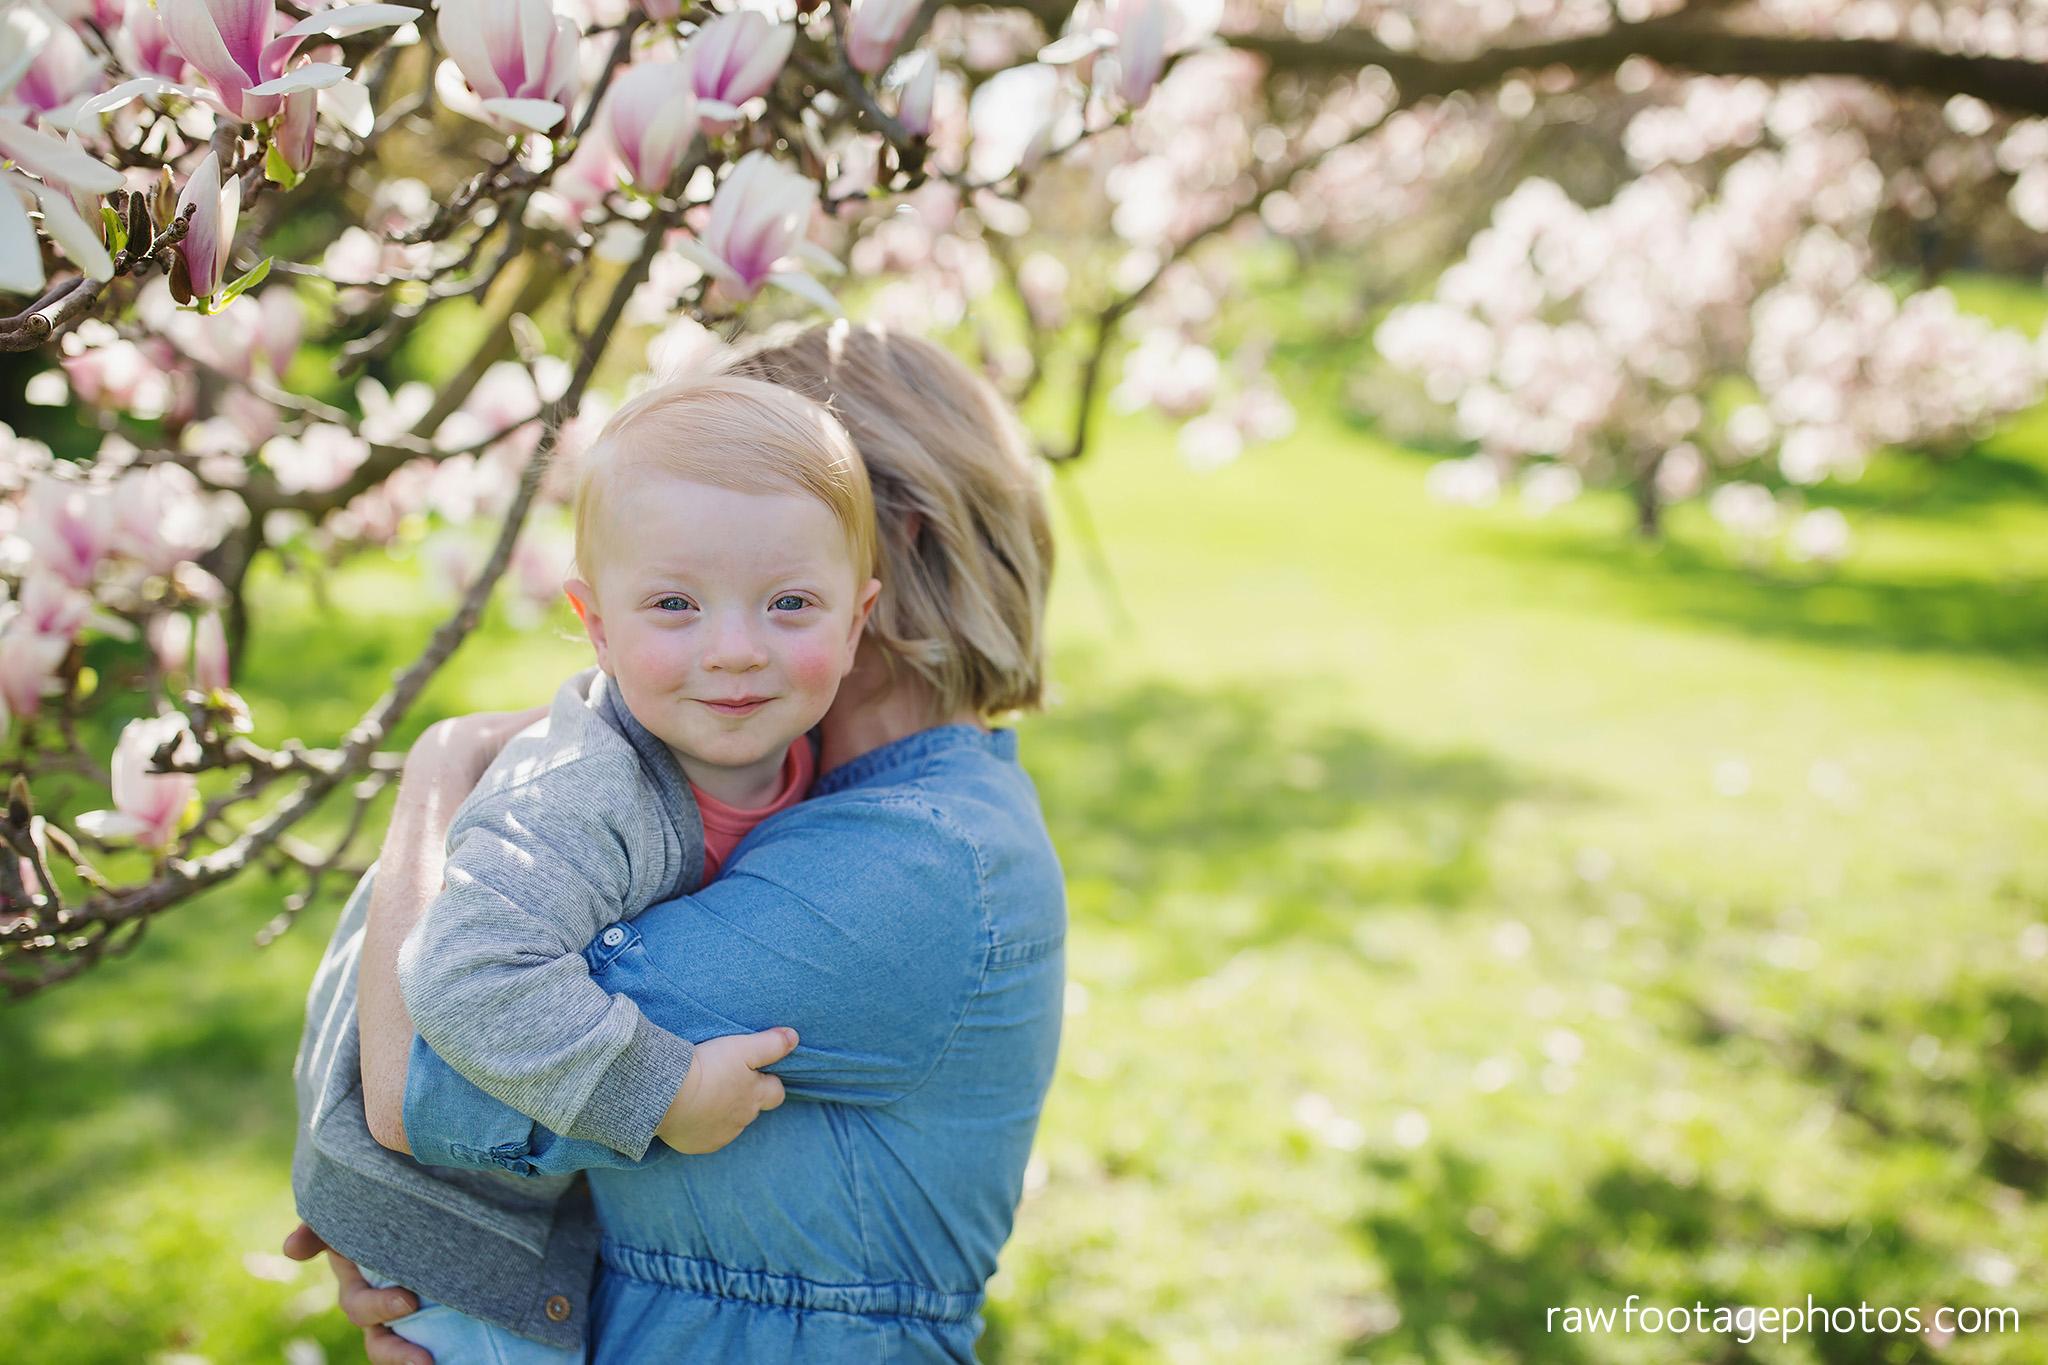 london_ontario_family_photographer-raw_footage_photography-spring_blossom_mini_sessions-magnolia-springbank_park011.jpg